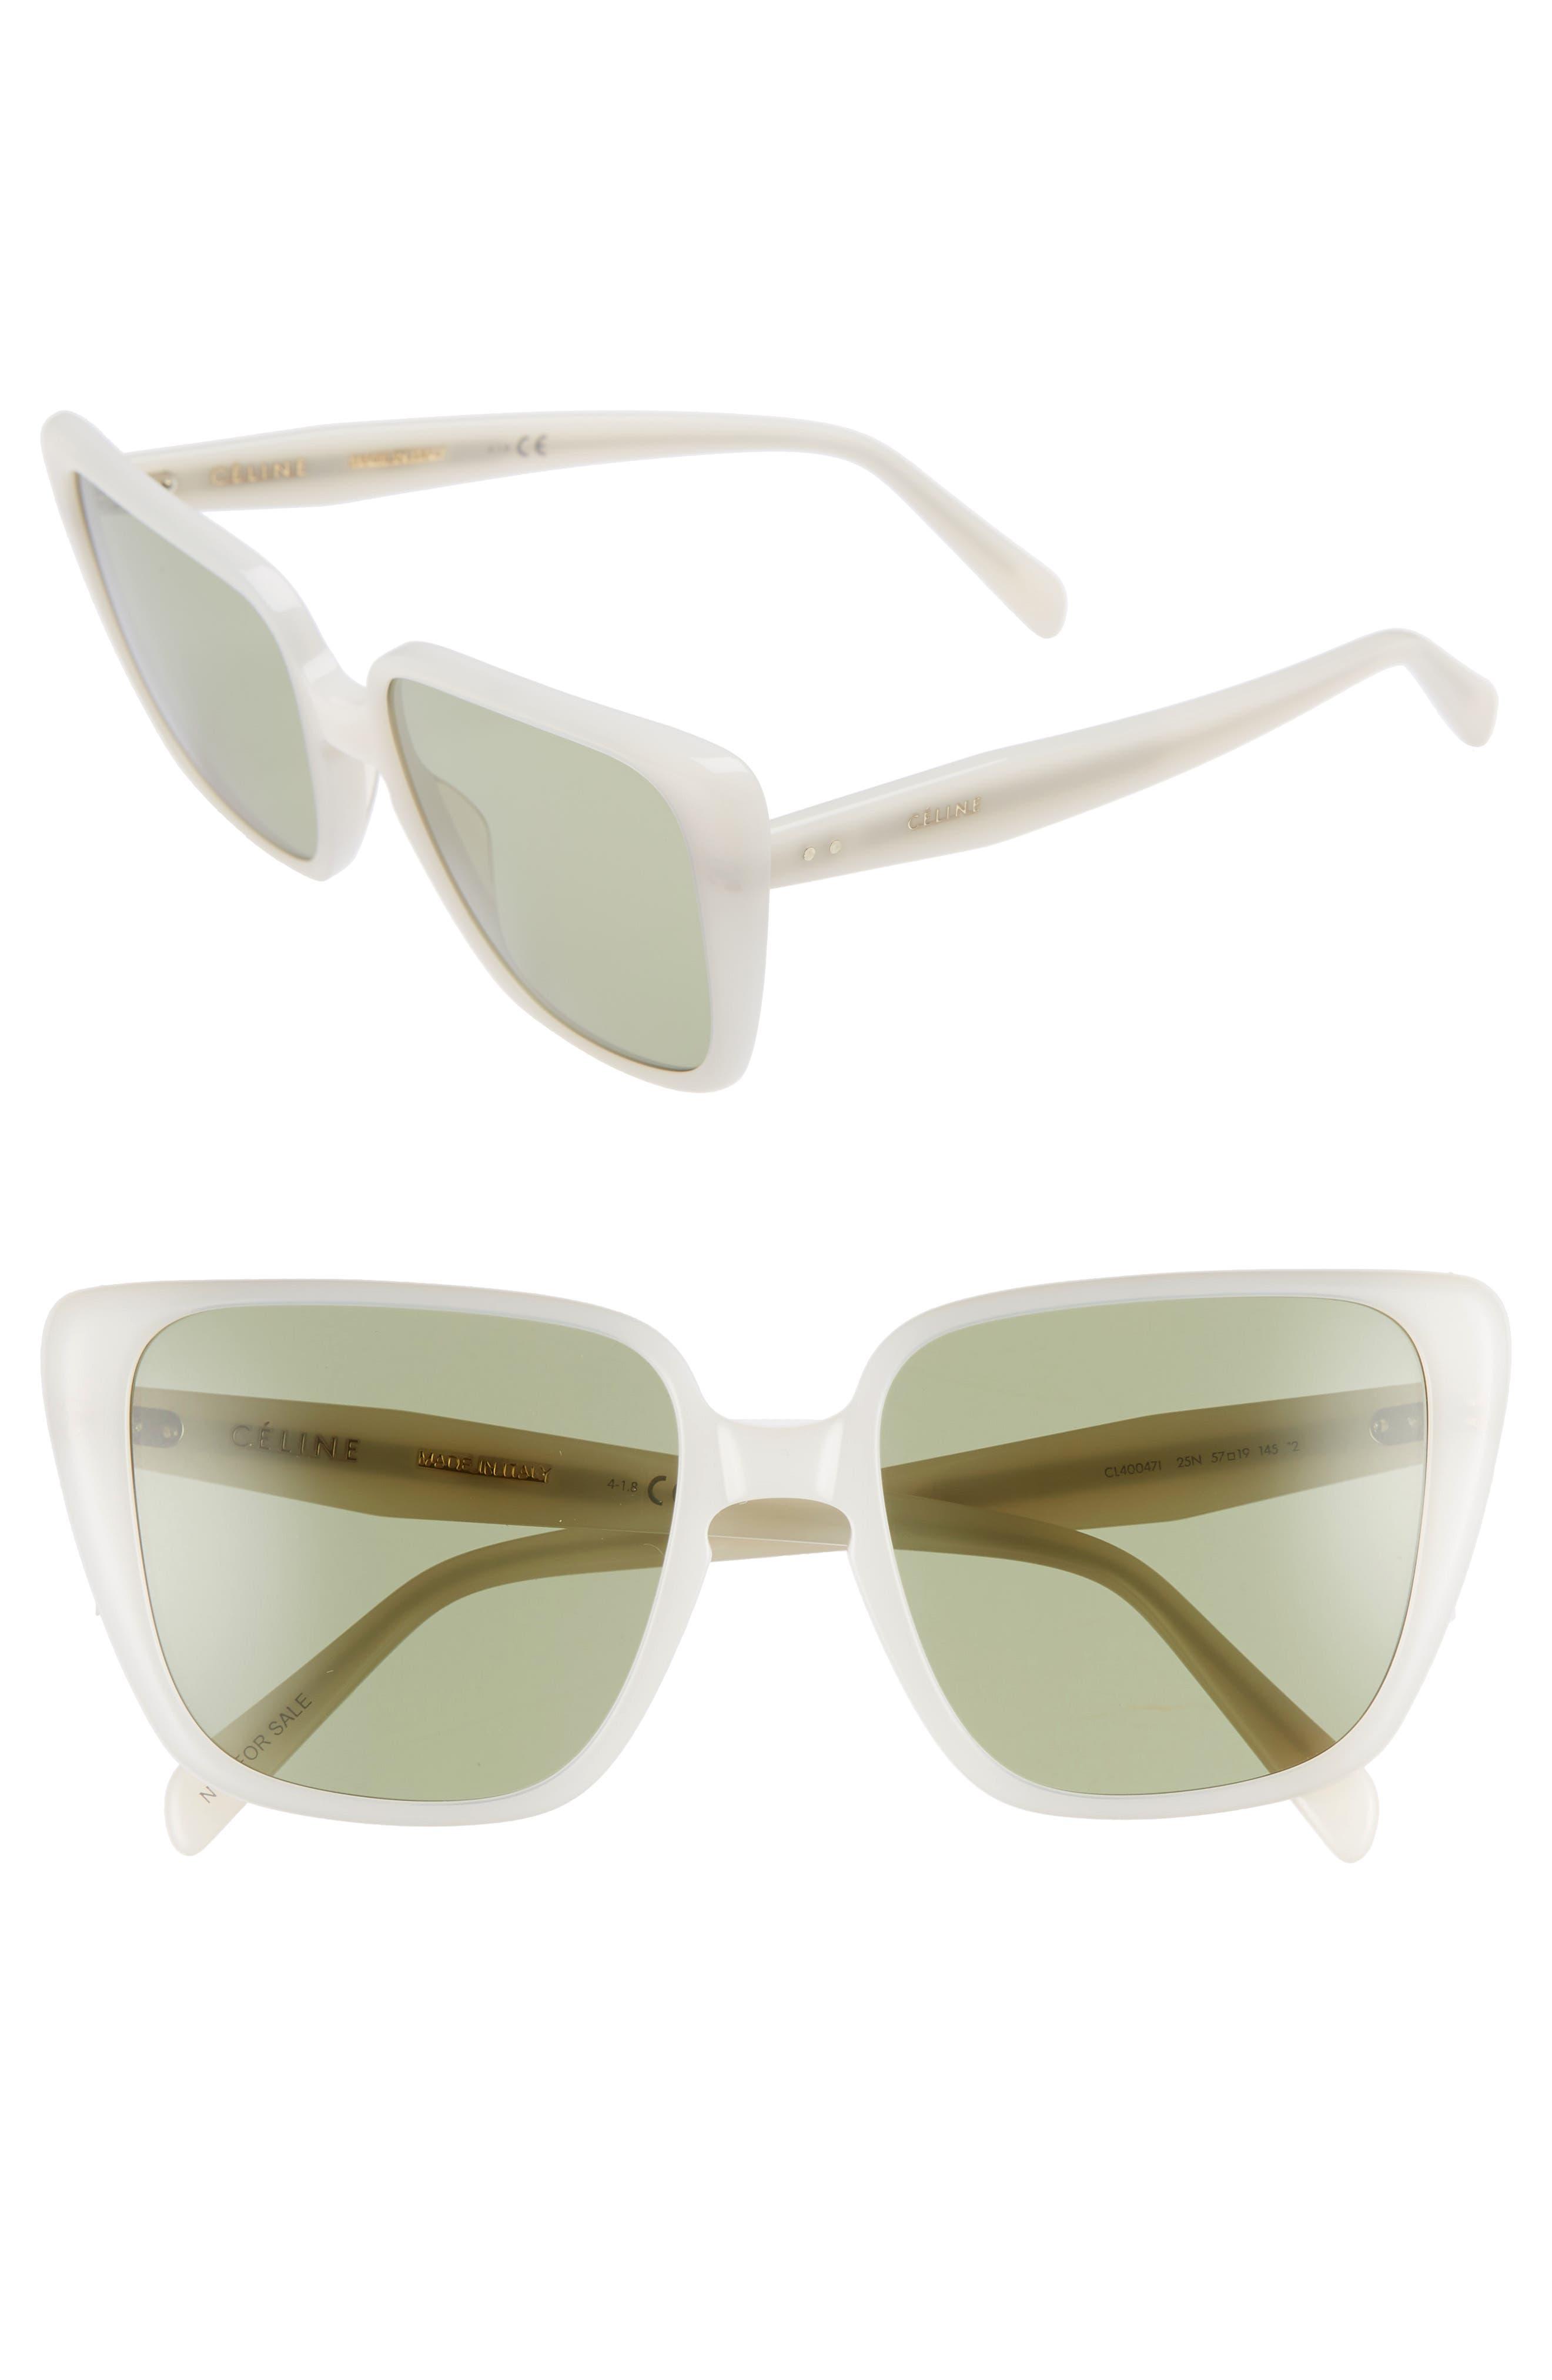 3d06952a1c6c Women s CELINE Cat-Eye Sunglasses